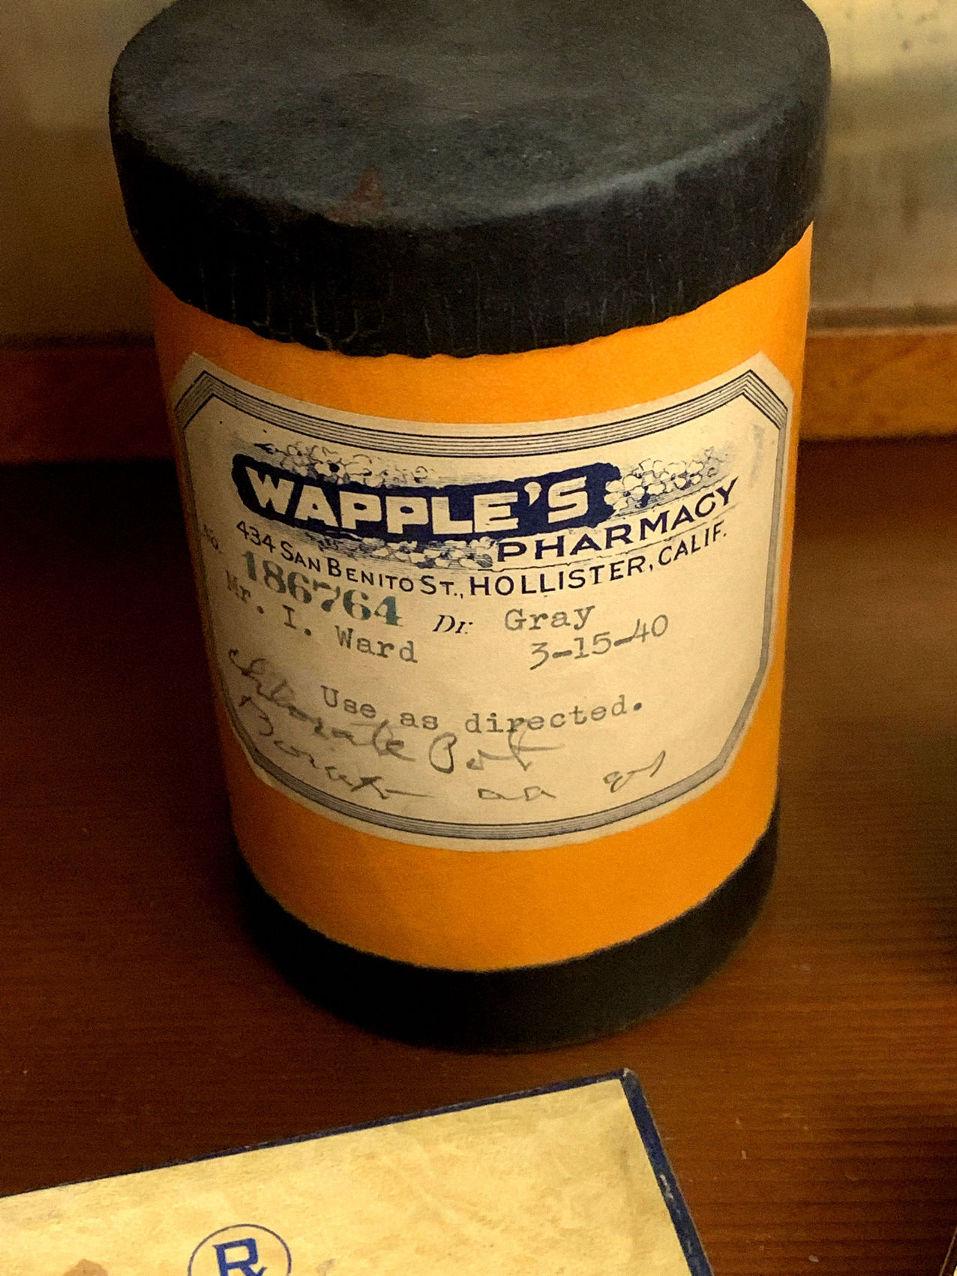 Prescription container. Photo by Robert Eliason.